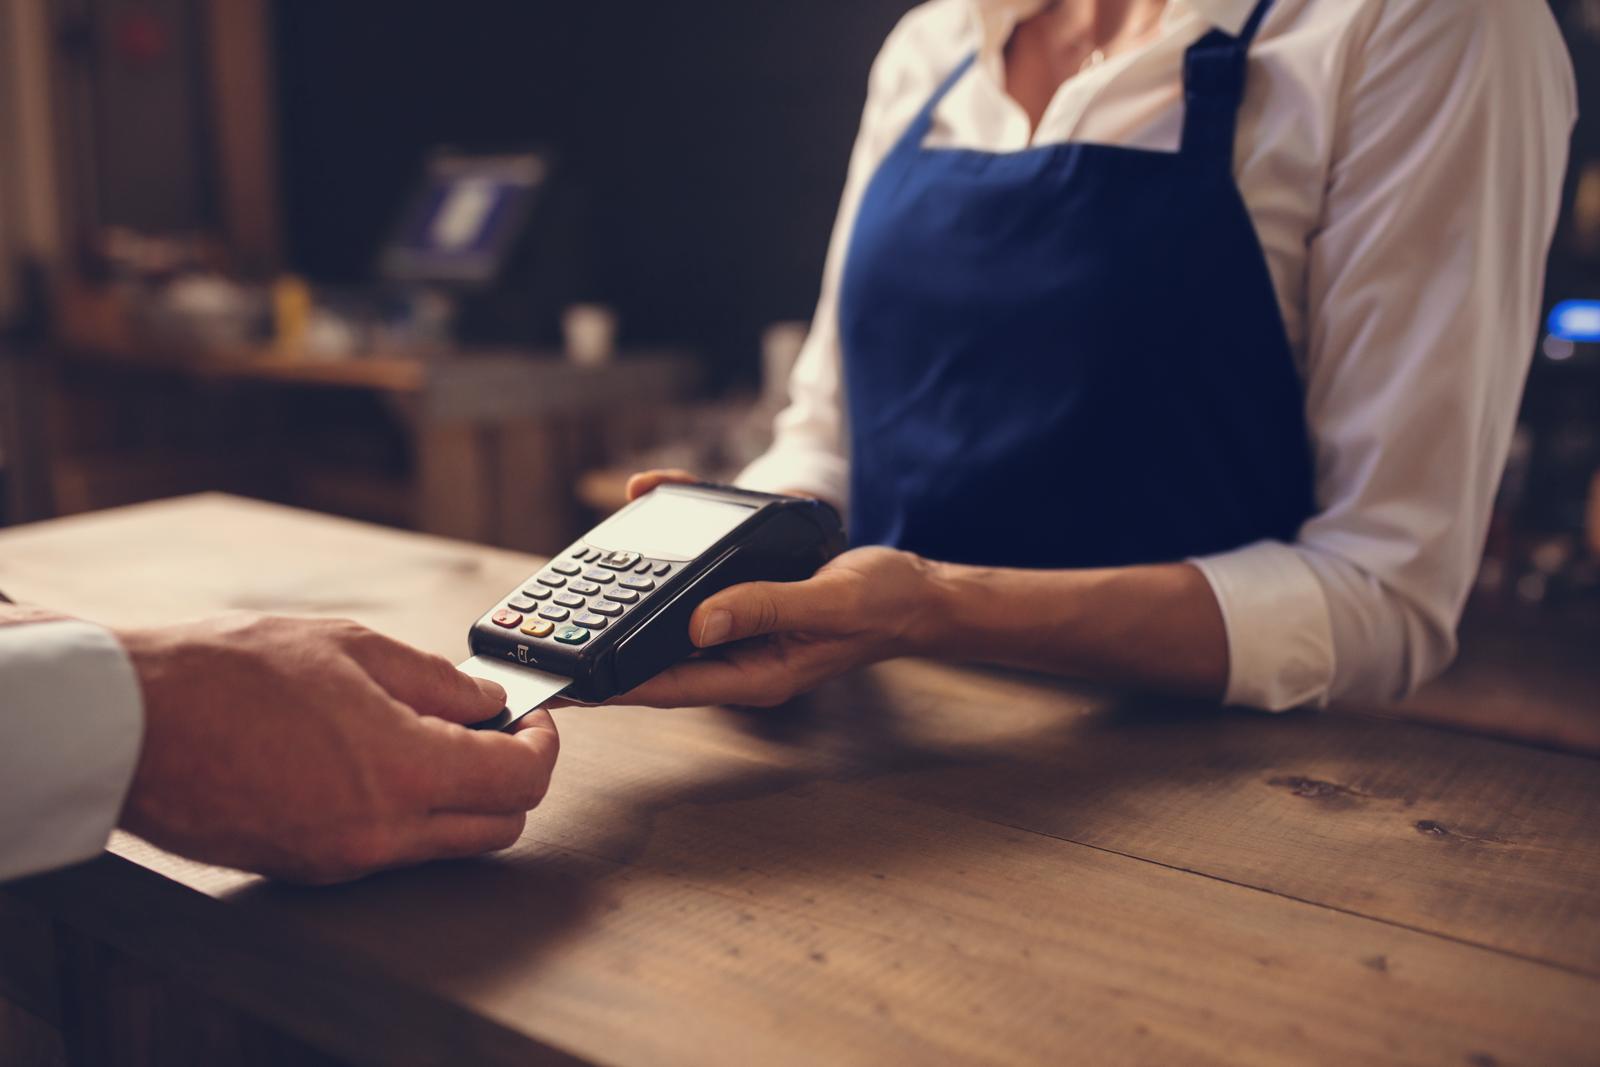 Novas regras do cheque especial: o que muda para os clientes Agibank